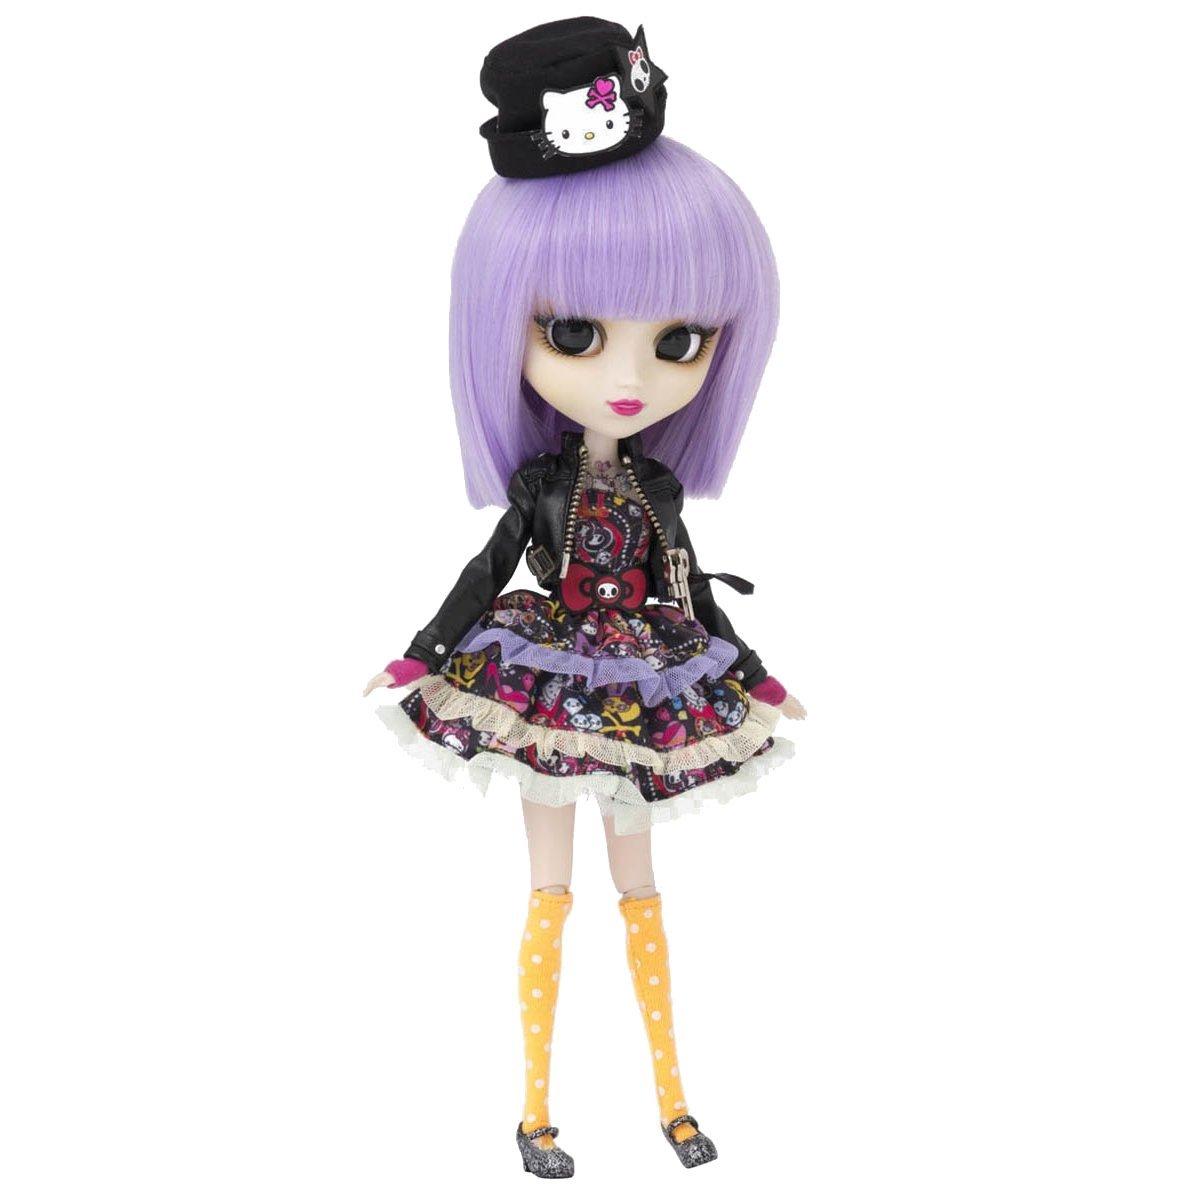 Pullip TOKIDOKI×HELLOKITTY Violetta (トキドキ×ハローキティ ヴァイオレッタ) P-116 グルーヴ